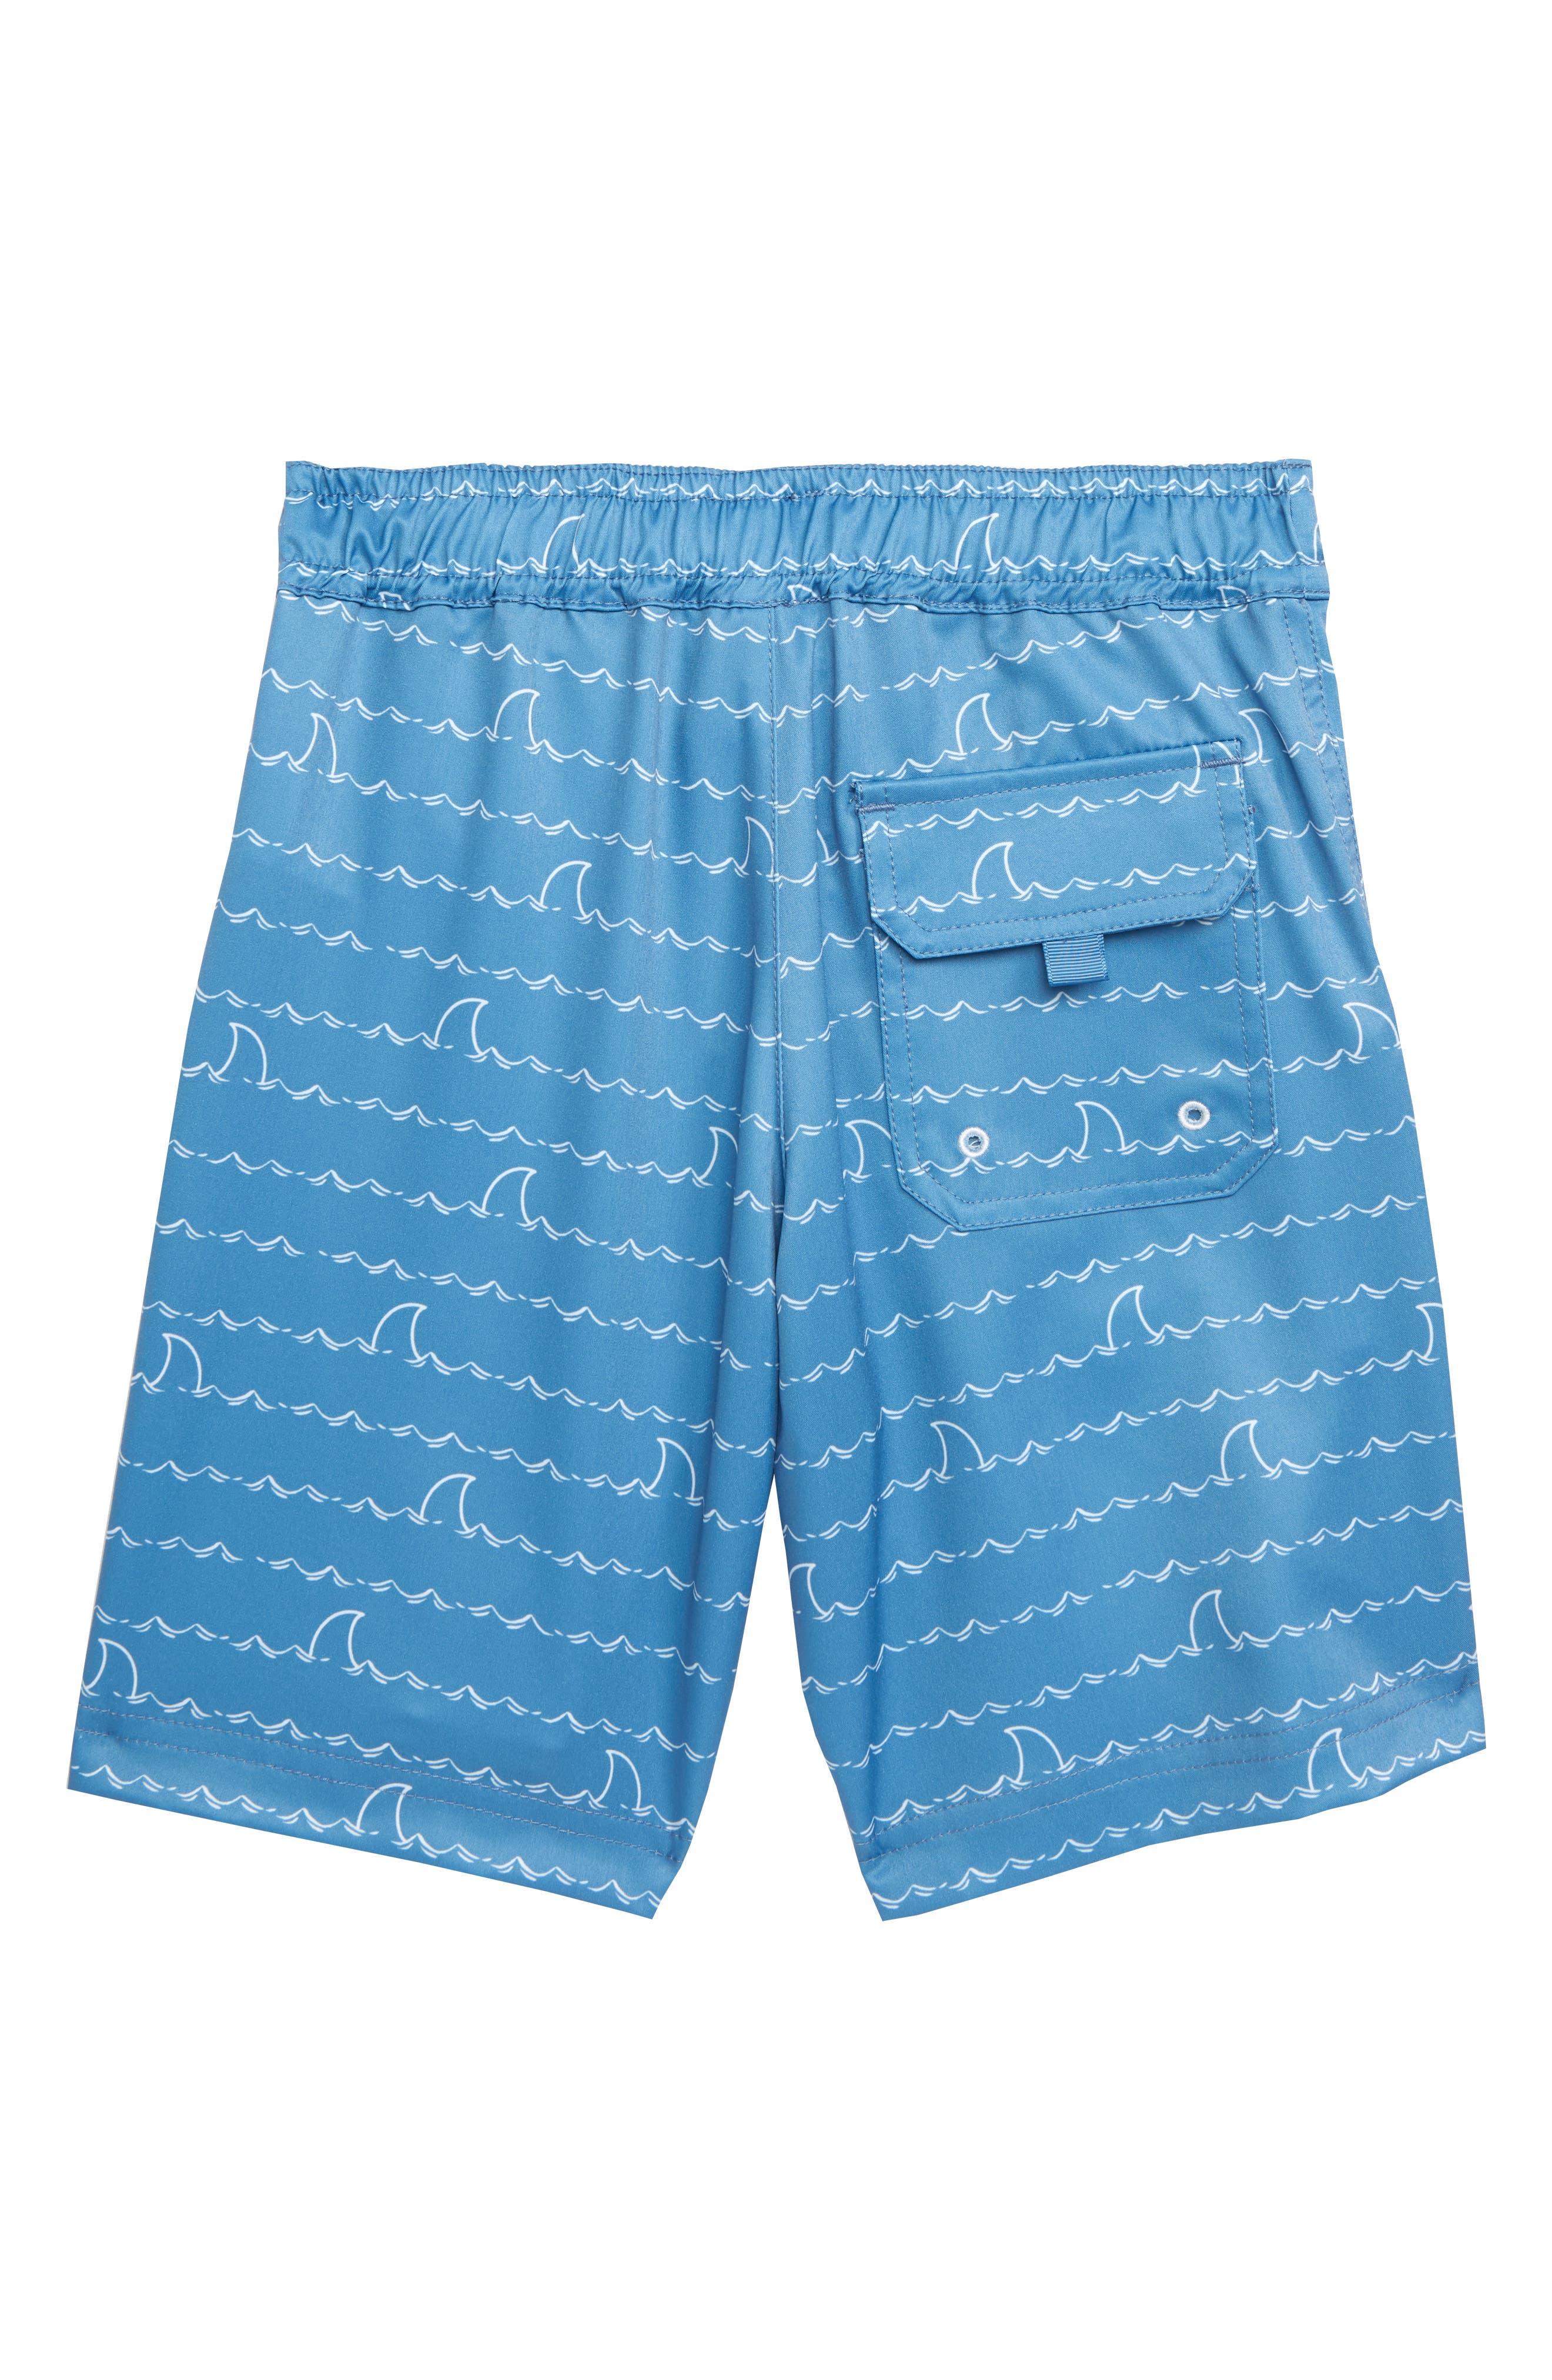 HATLEY, Shark Fin Quick Drying Shorts, Alternate thumbnail 2, color, 400